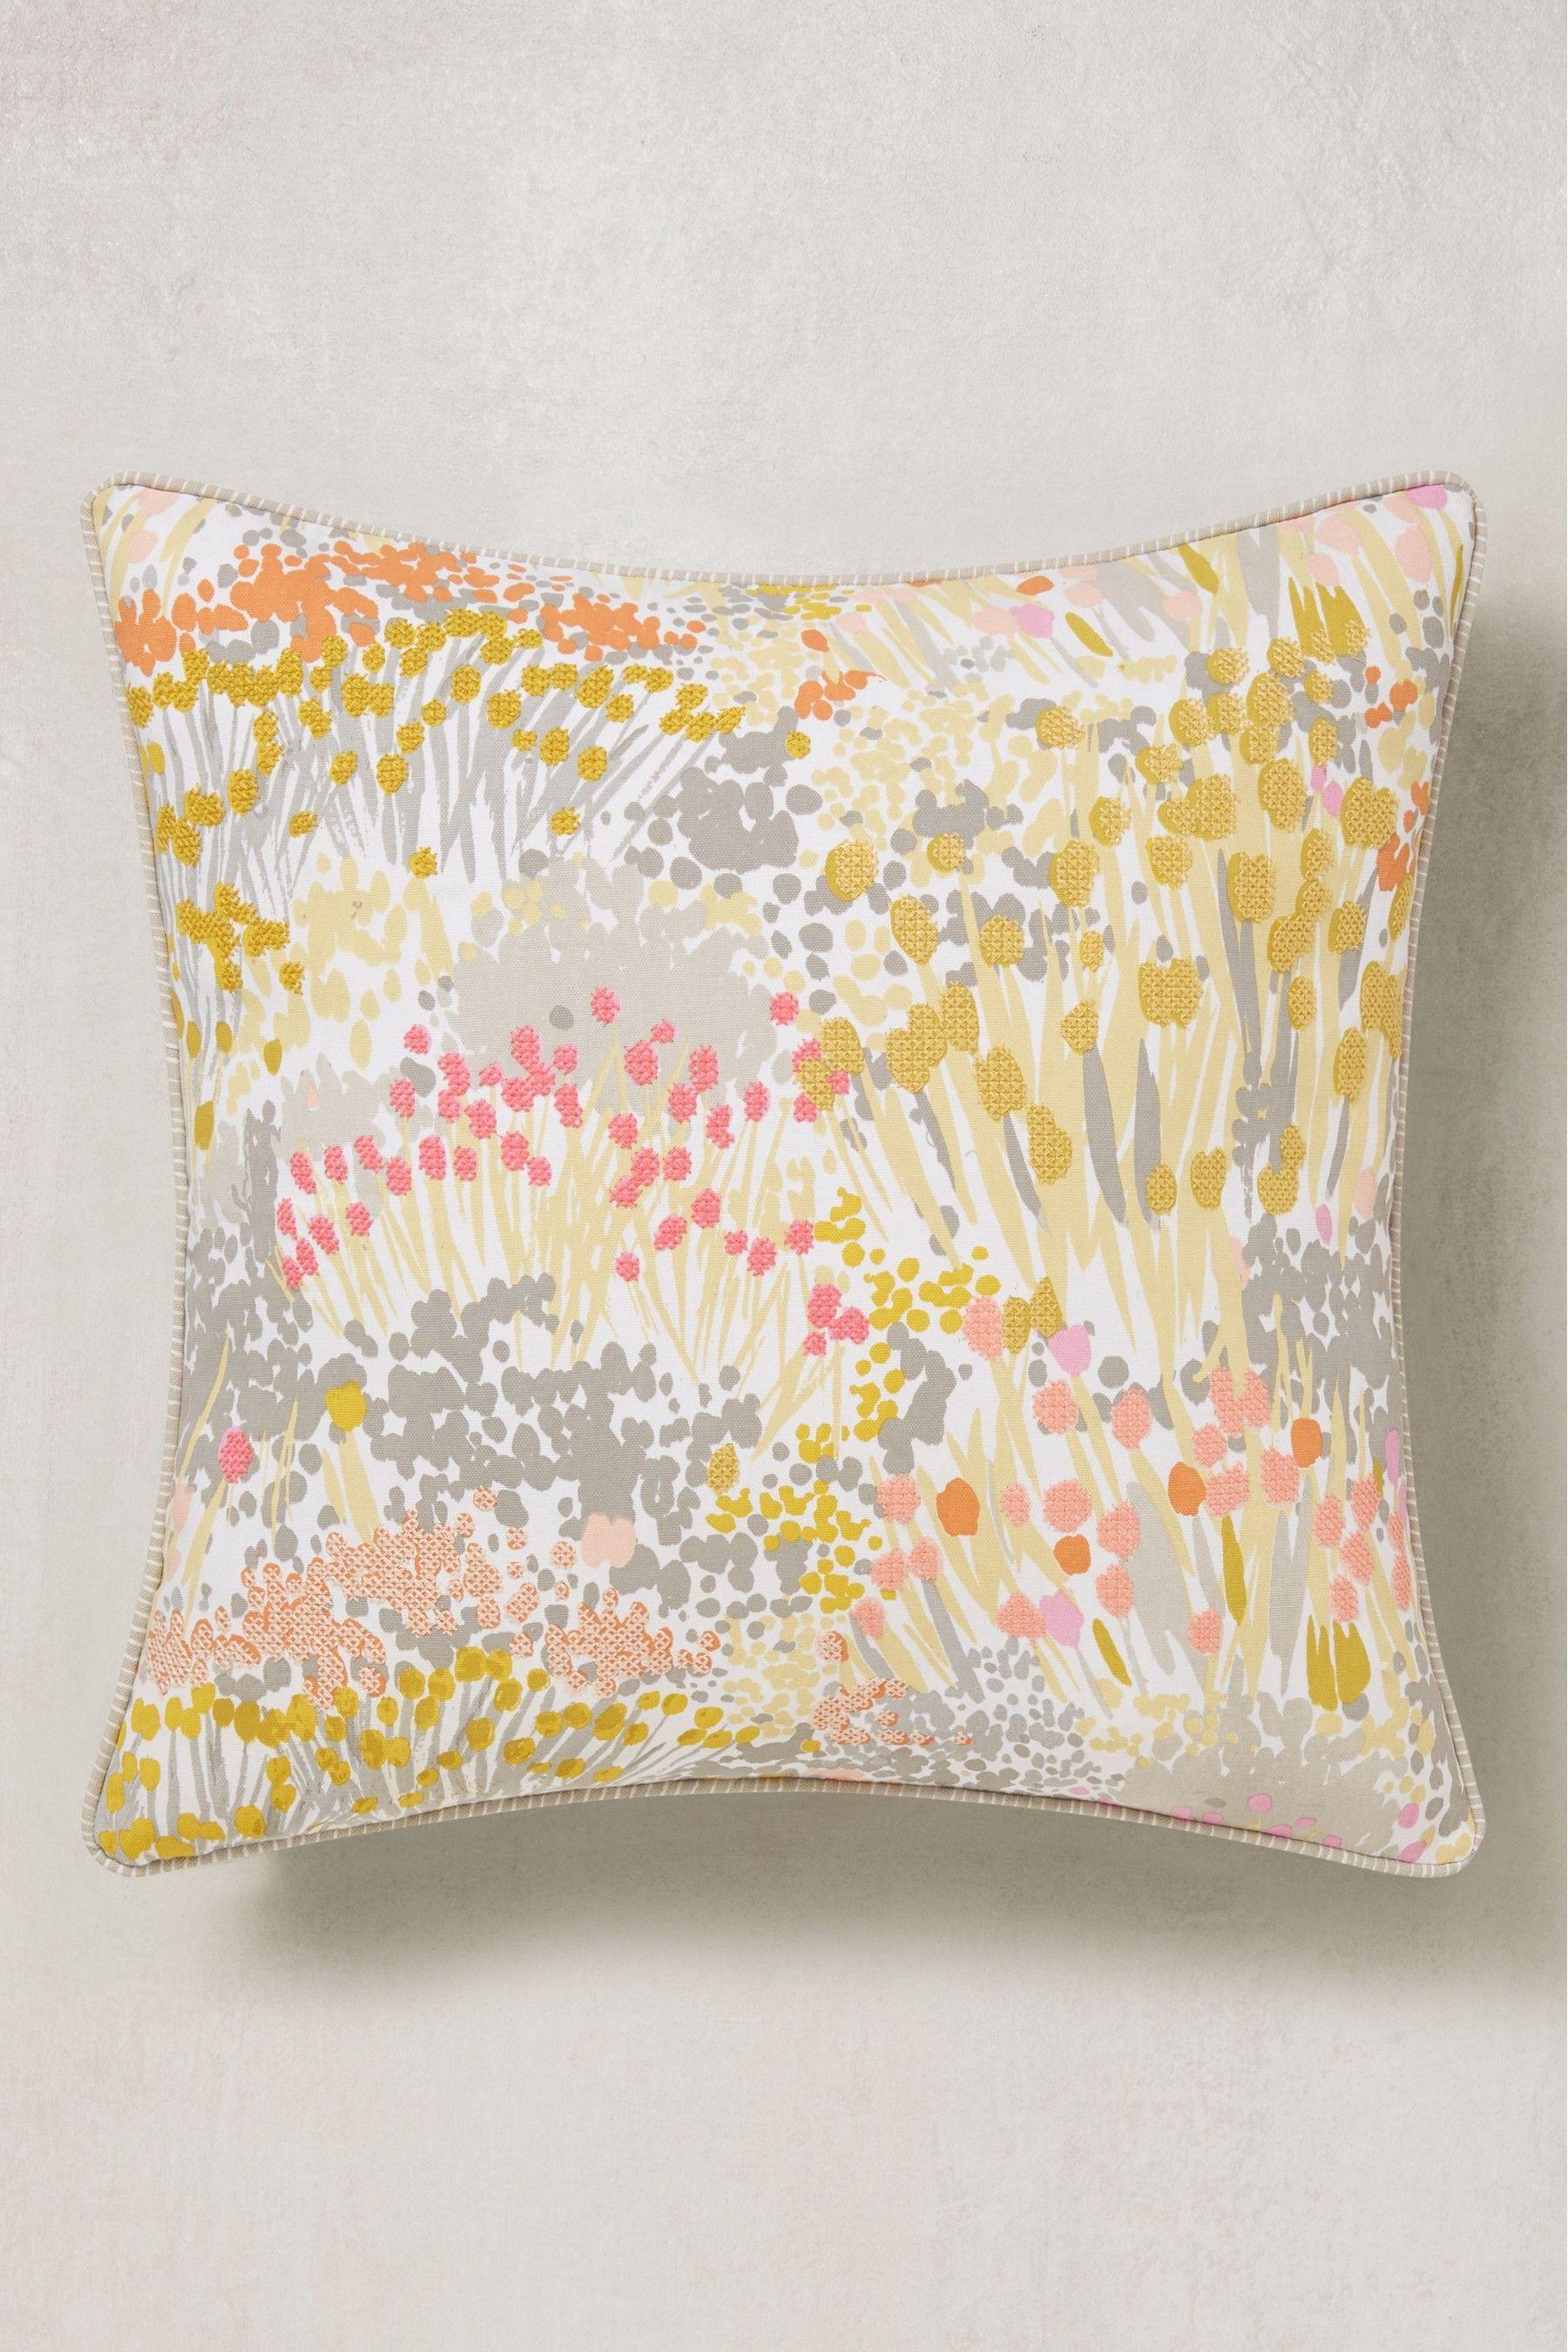 e-mail me Colour Codes 10 x 42m TORCAL Perle #5 Crochet Embroidery Thread